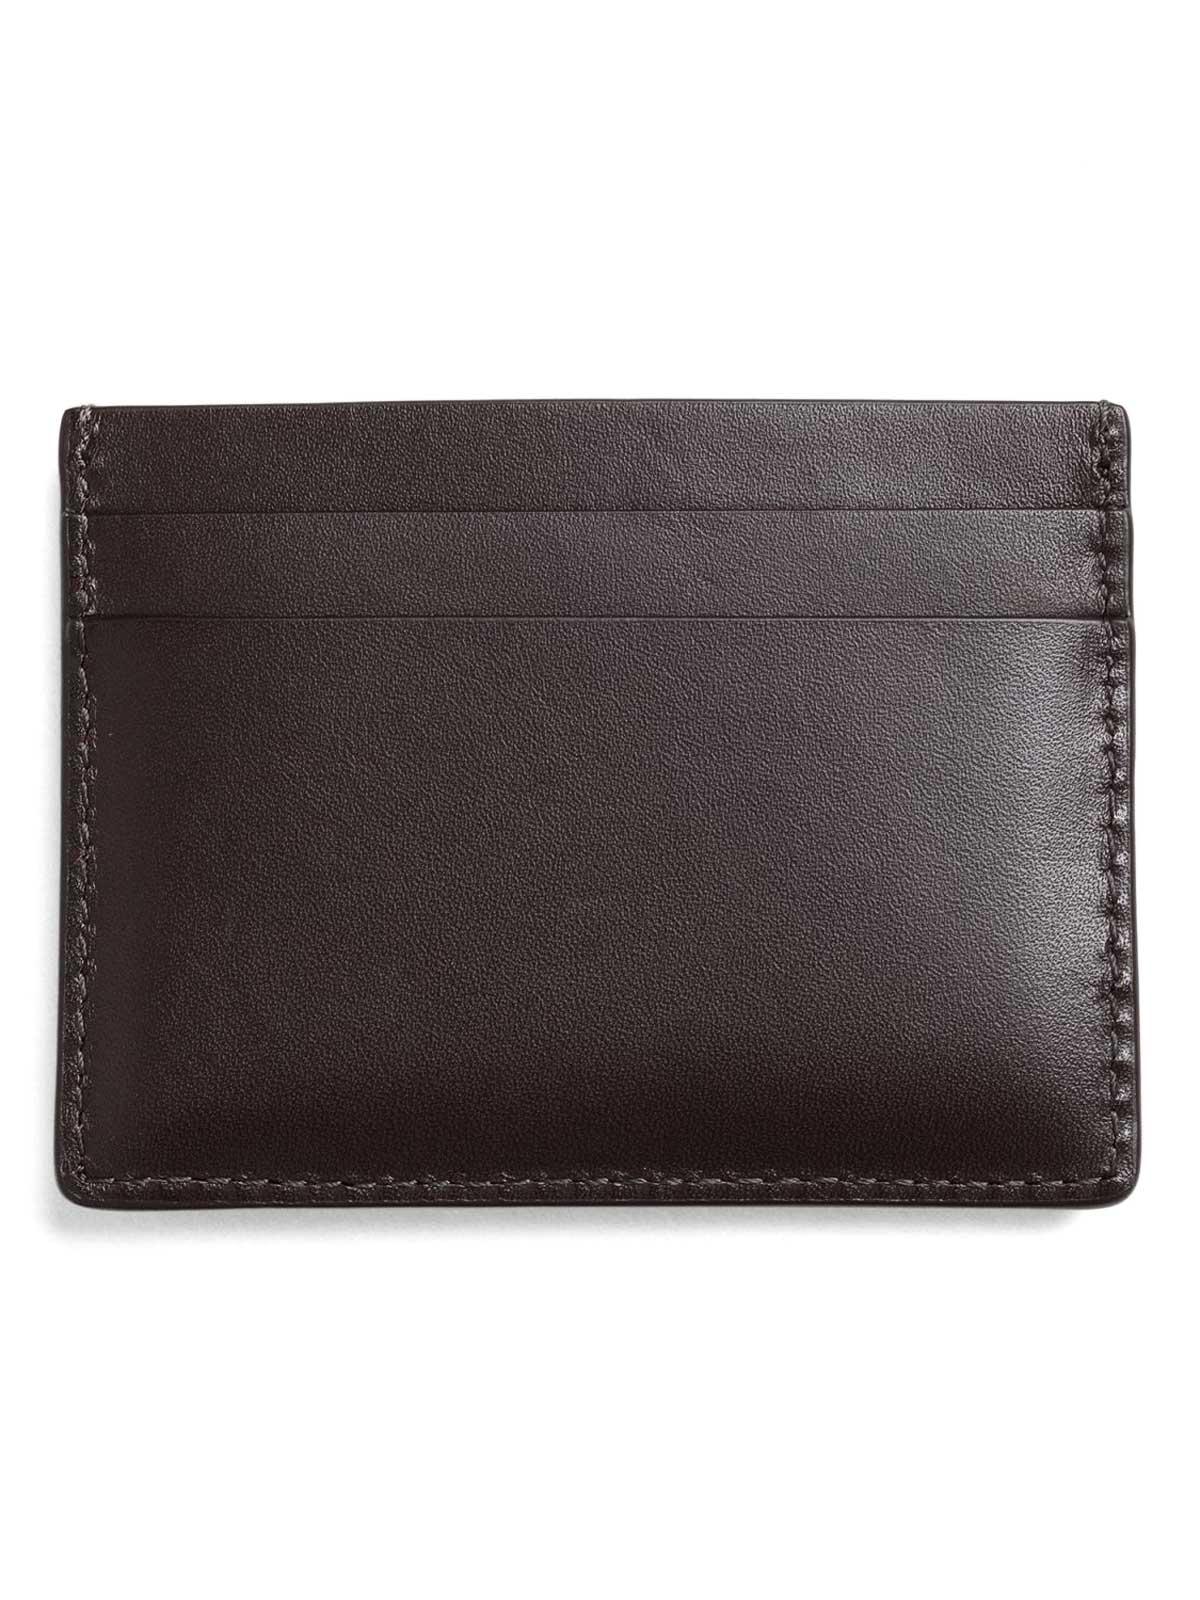 Immagine di Gant | Wallet D1. Leather Cardholder